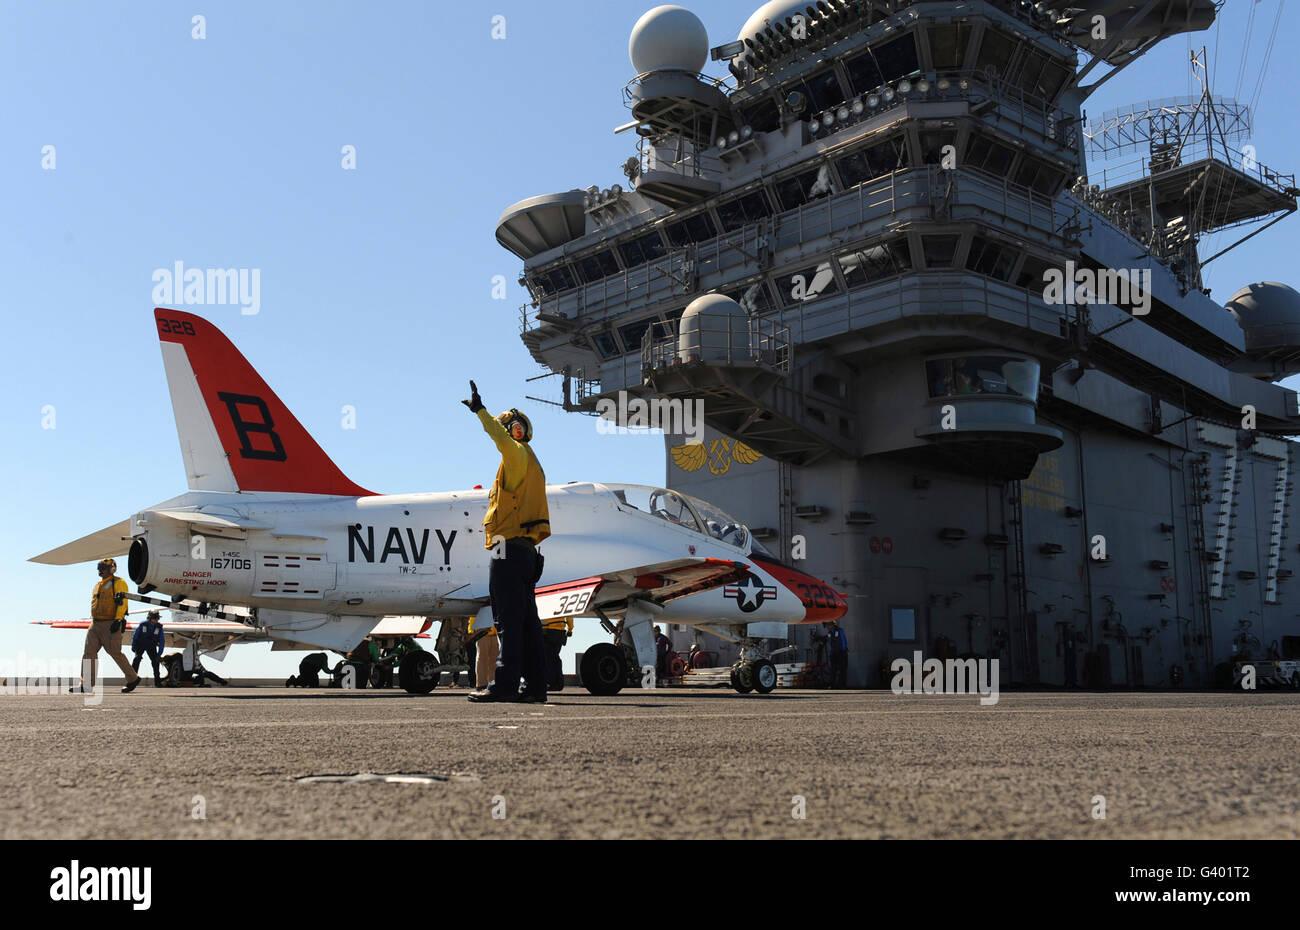 A T-45C Goshawk training aircraft on the flight deck of USS George H.W. Bush. - Stock Image